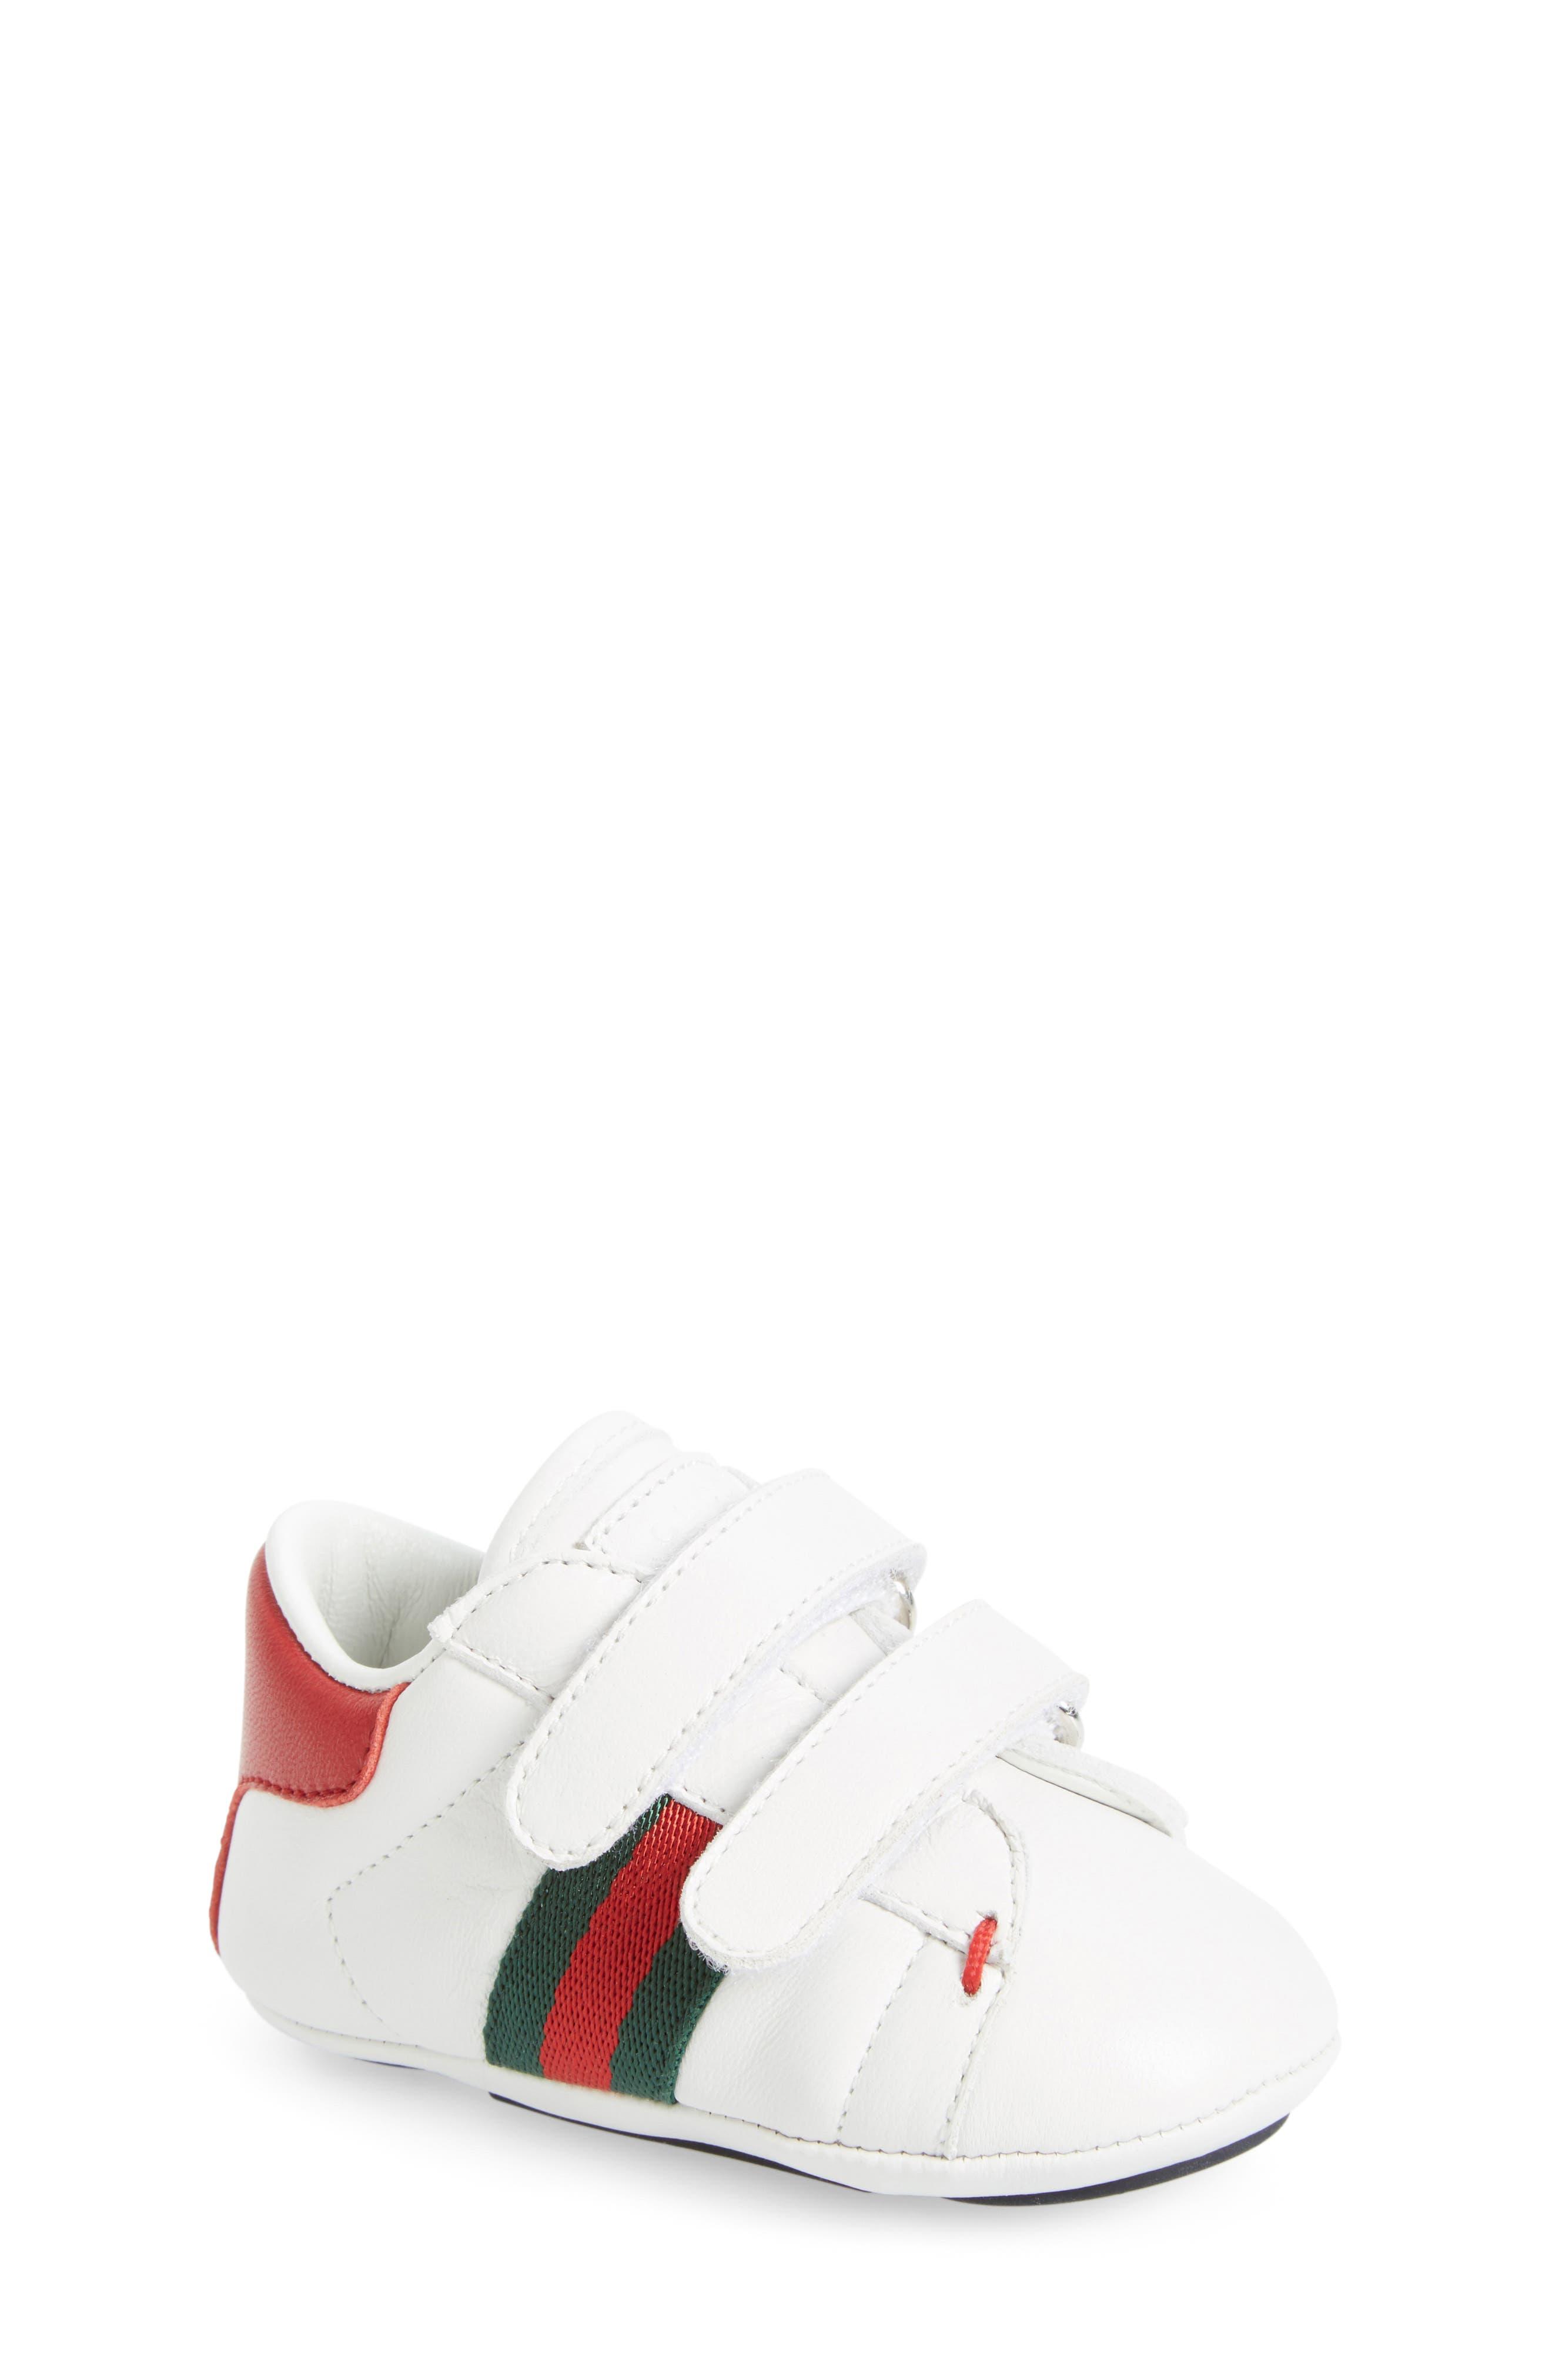 Main Image - Gucci 'Ace' Crib Shoe (Baby)